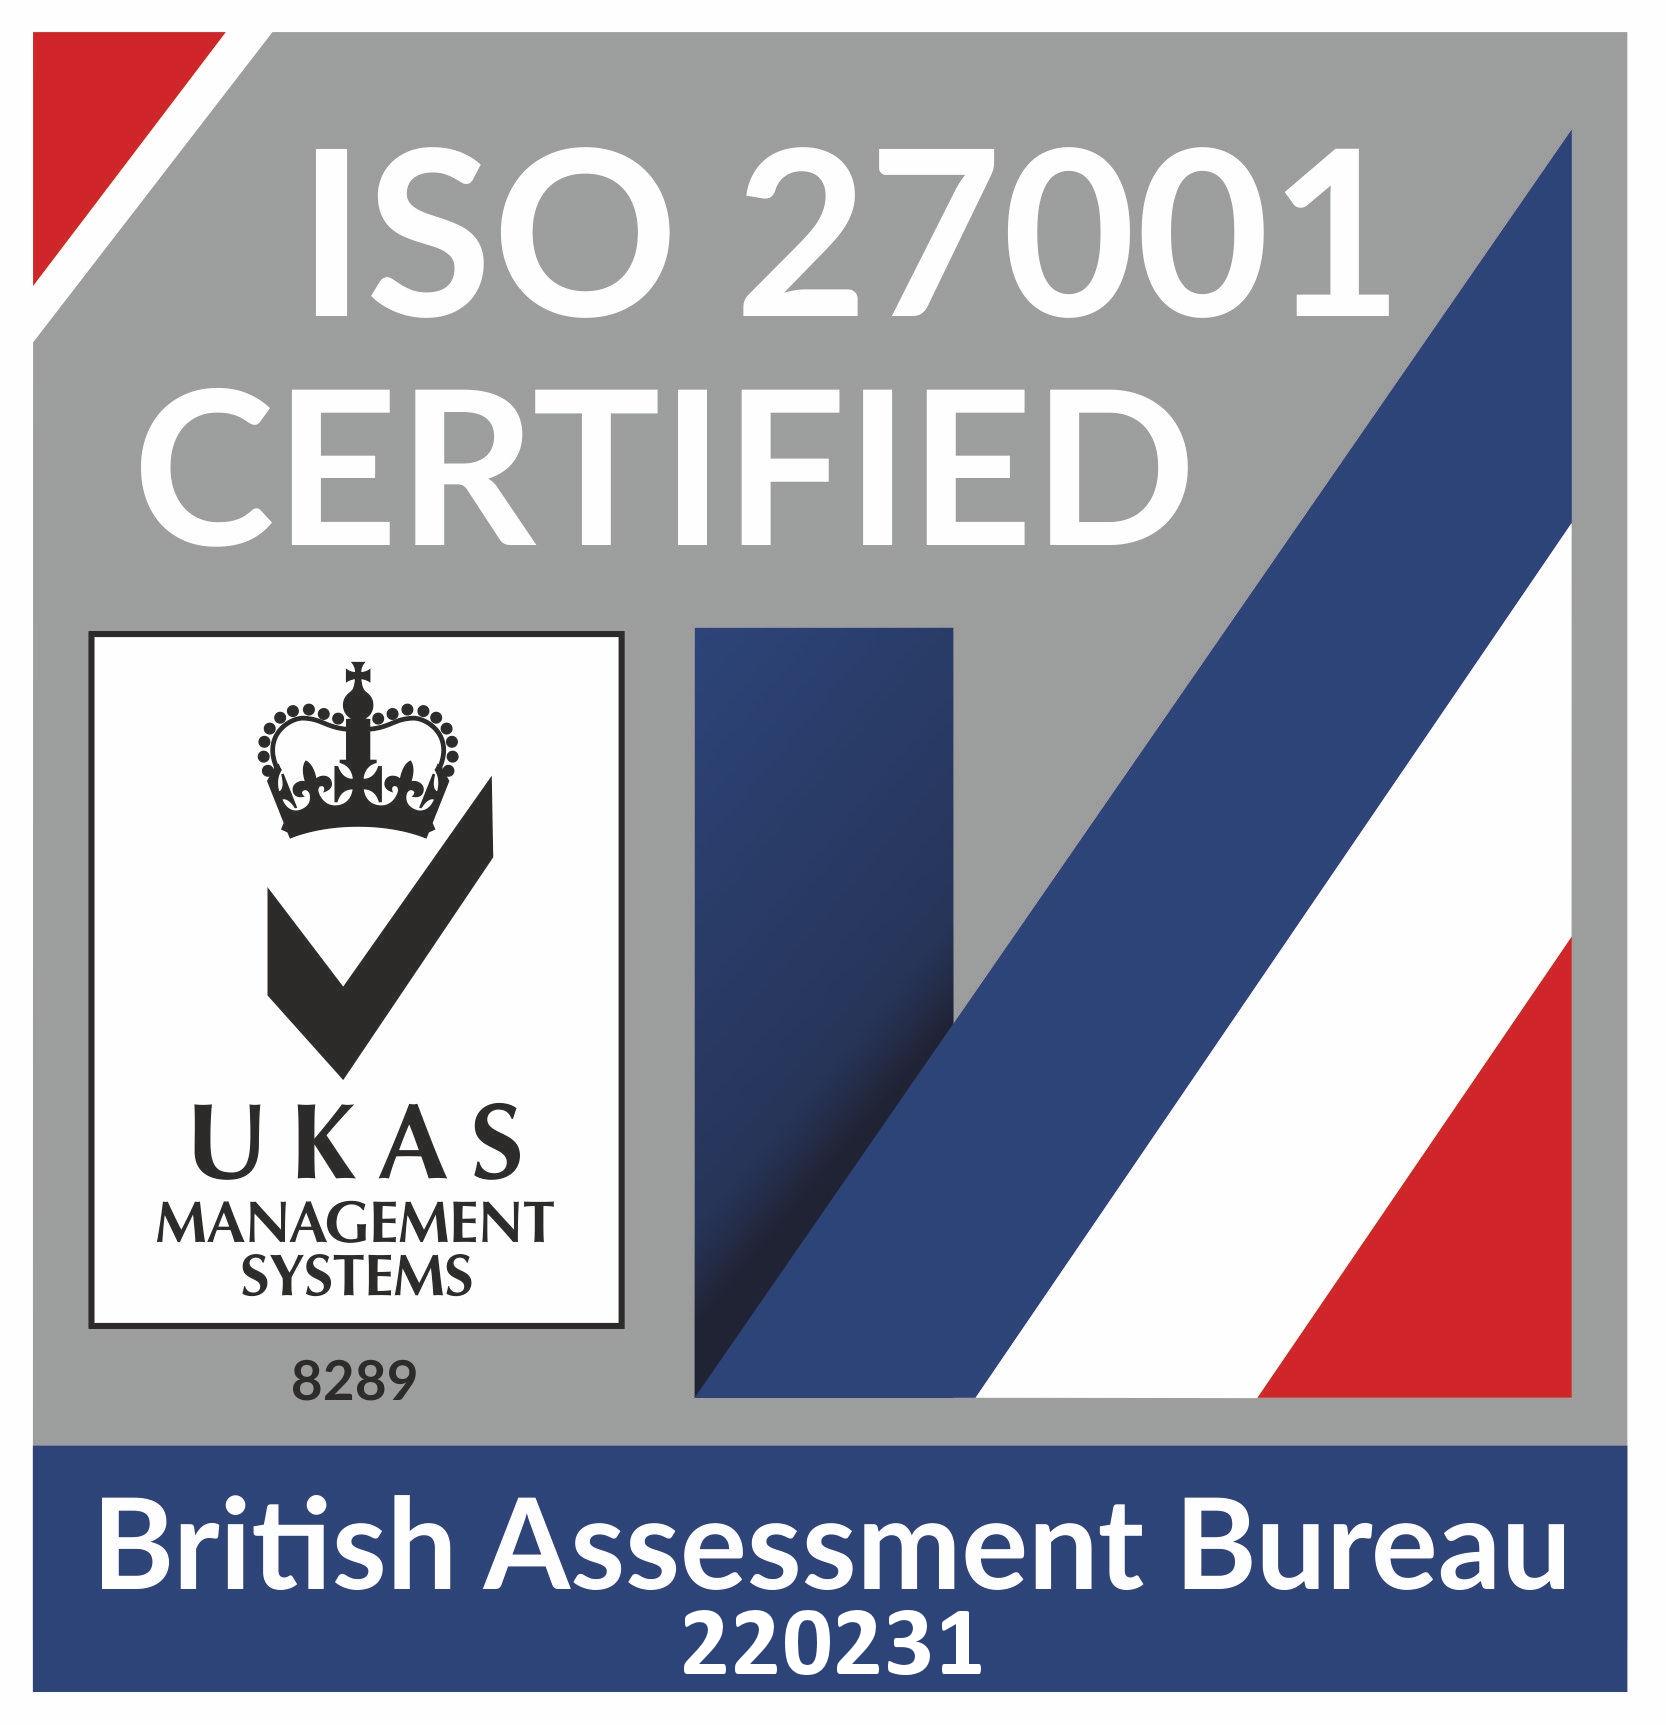 UKAS-ISO-27001-220231   Anywhere Sim.png